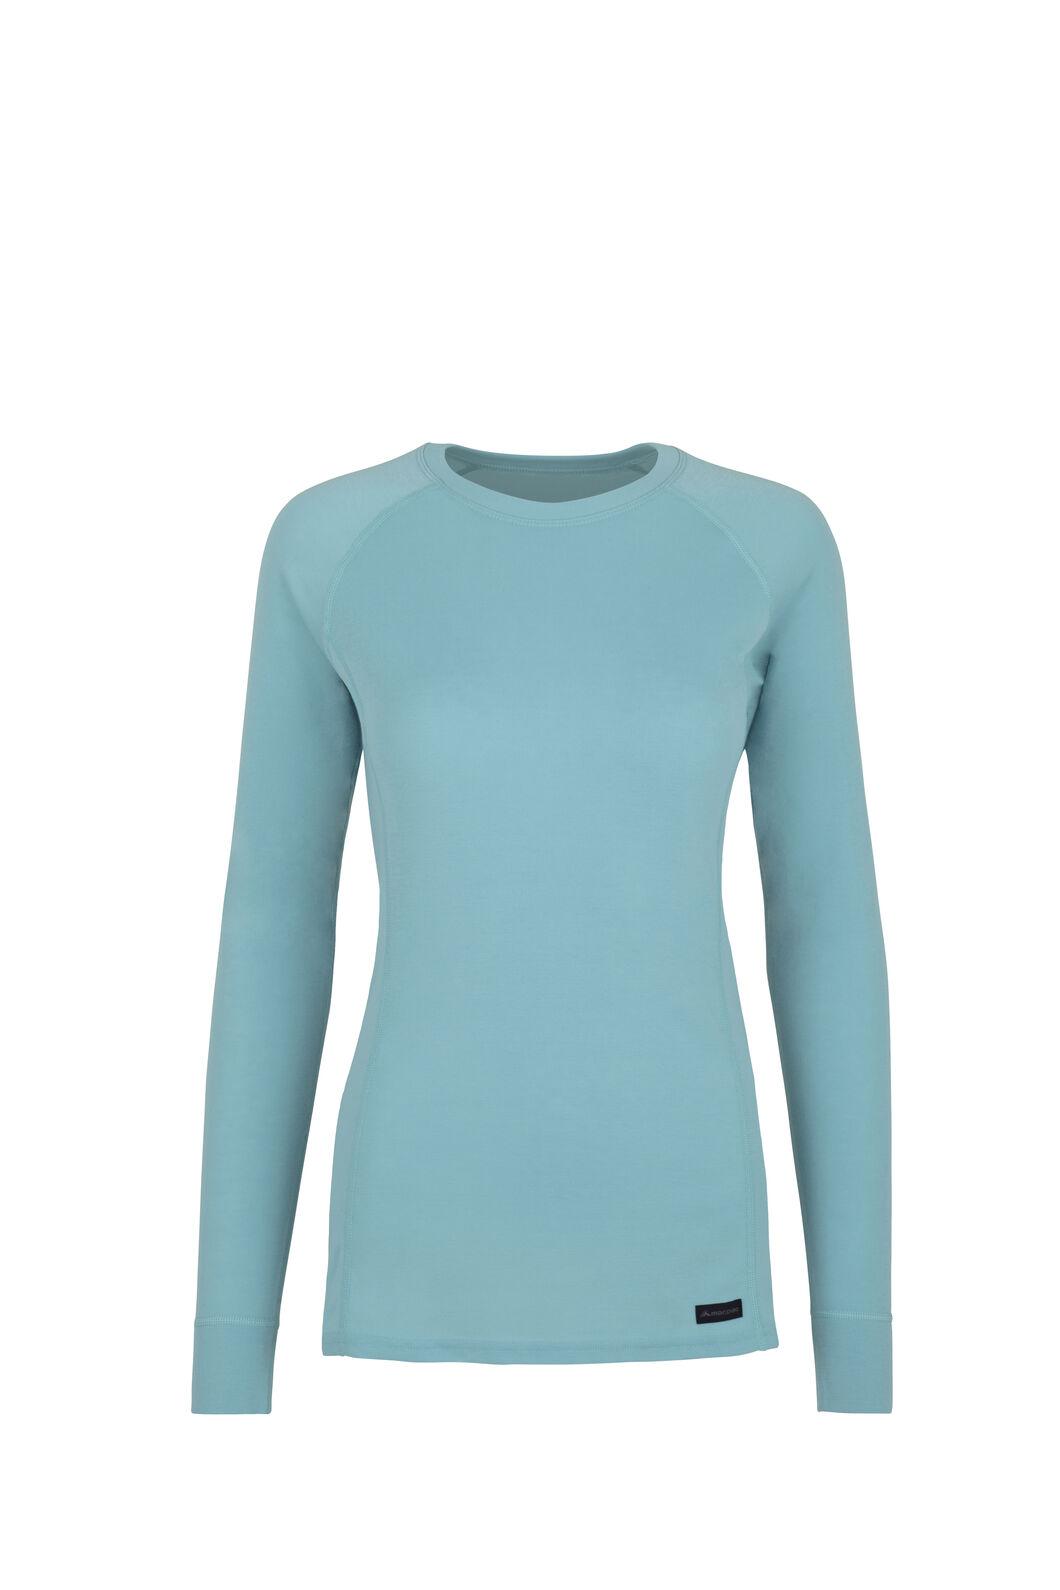 Macpac Geothermal Long Sleeve Top - Women's, Etheral Blue, hi-res